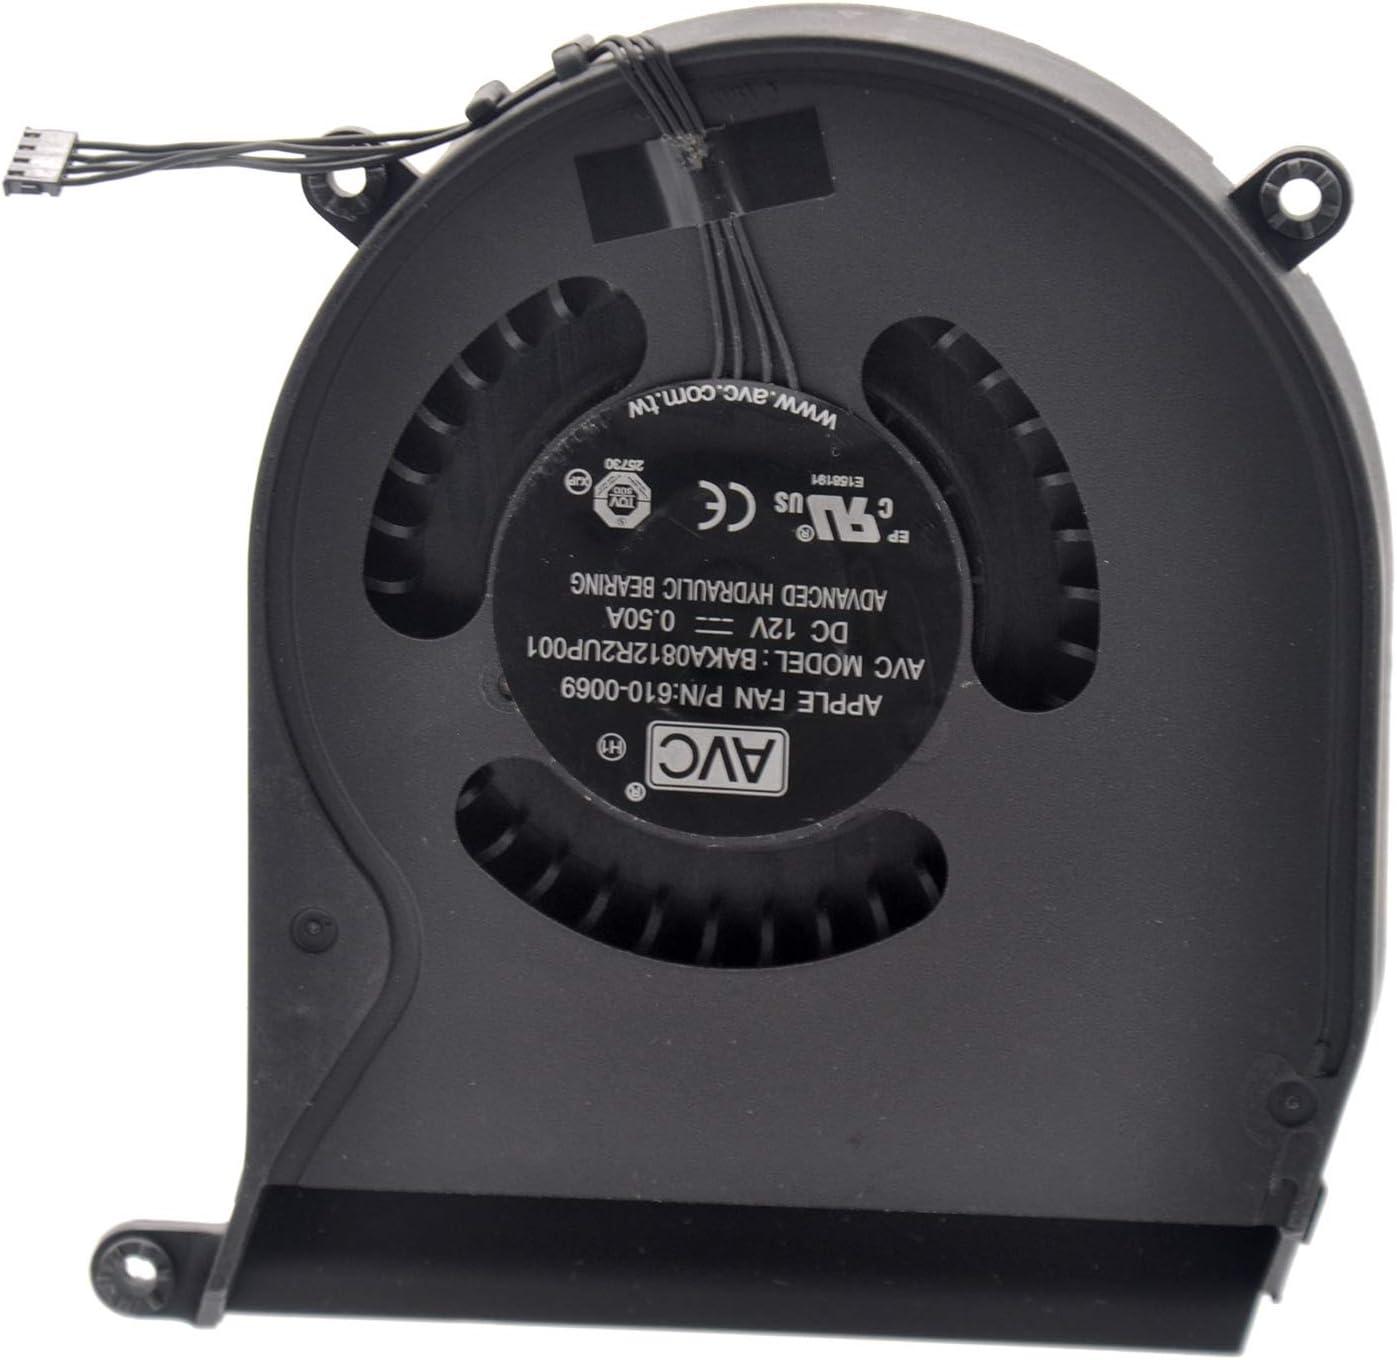 Deal4GO CPU Cooling Fan for Apple Mac Mini A1347 CPU Fan 2010 2011 2012 610-0069 922-9953 610-0056 922-9557 610-9557 610-0164 BAKA0812R2UP001